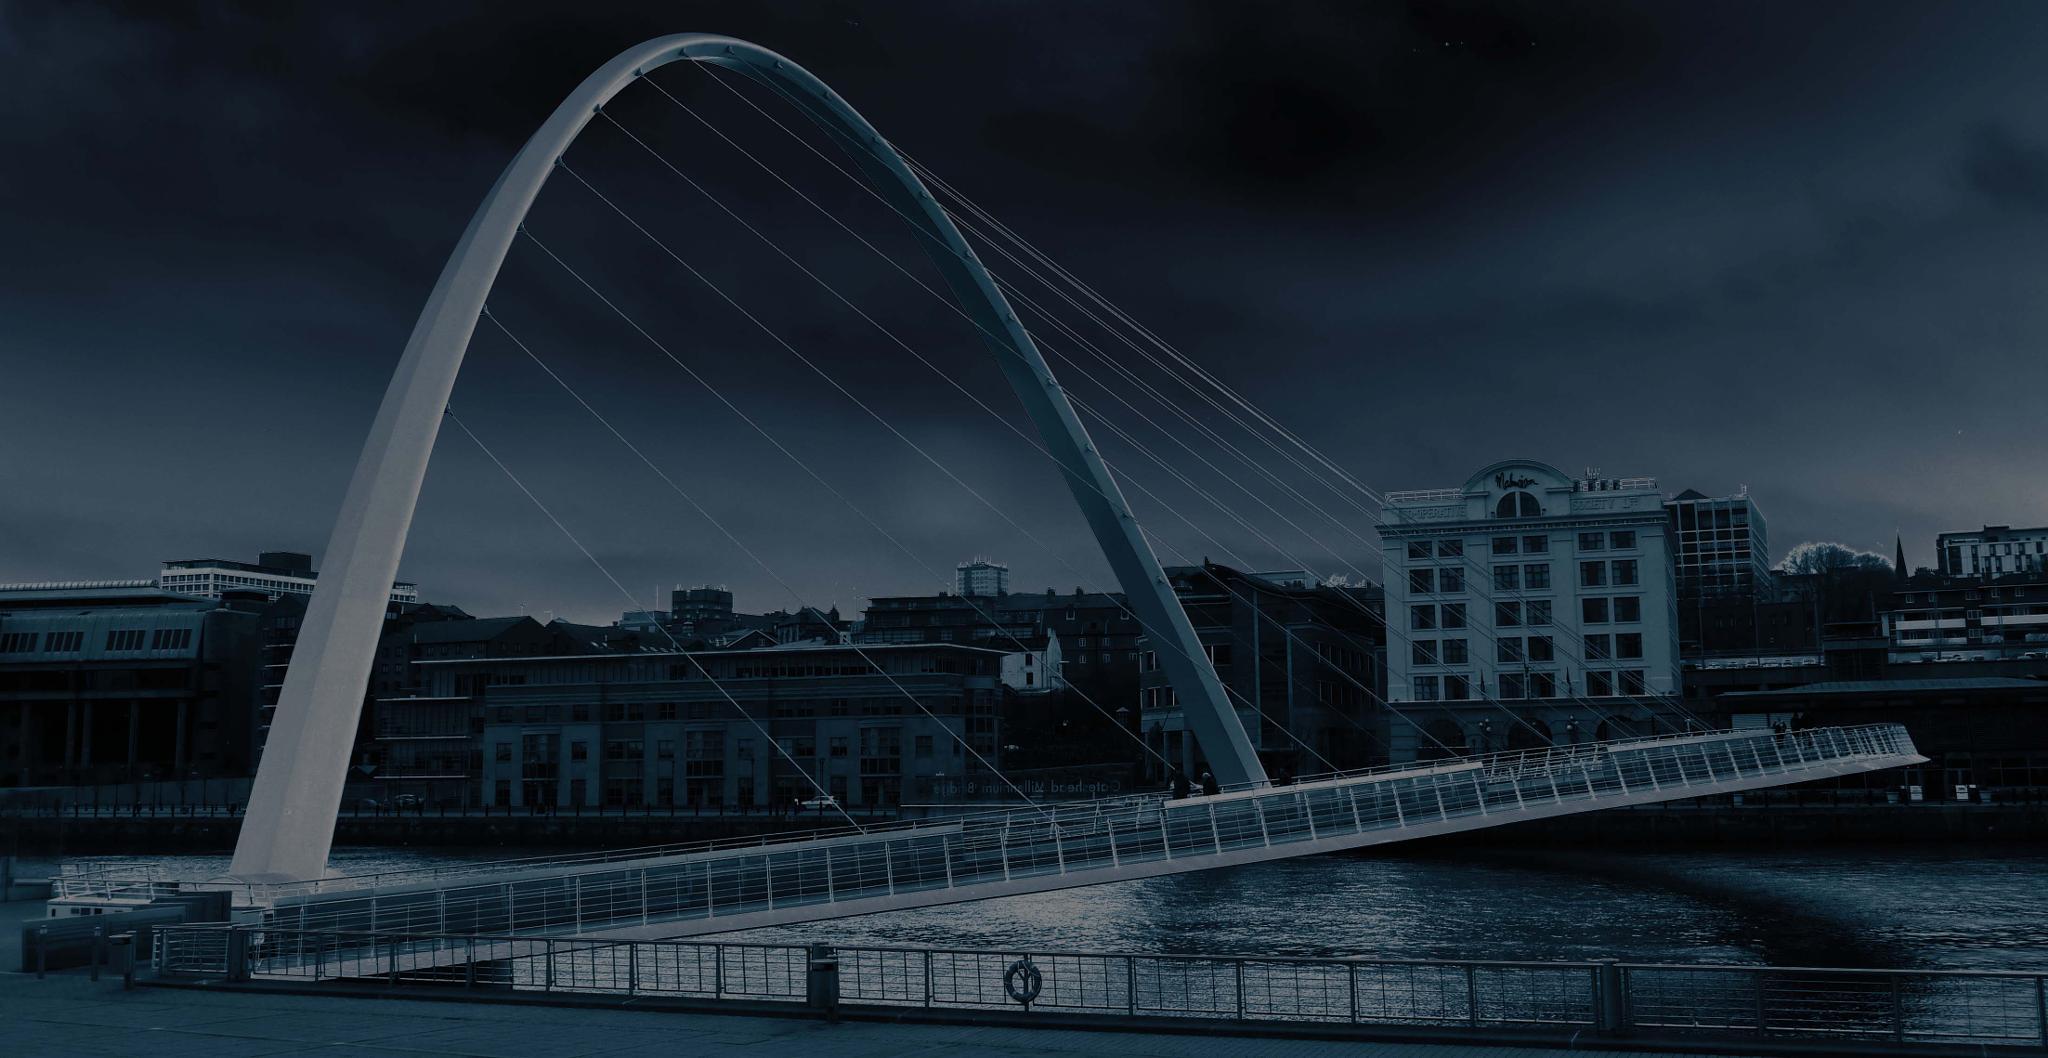 Gateshead Millennium Bridge in Blue................. by Darren Turner